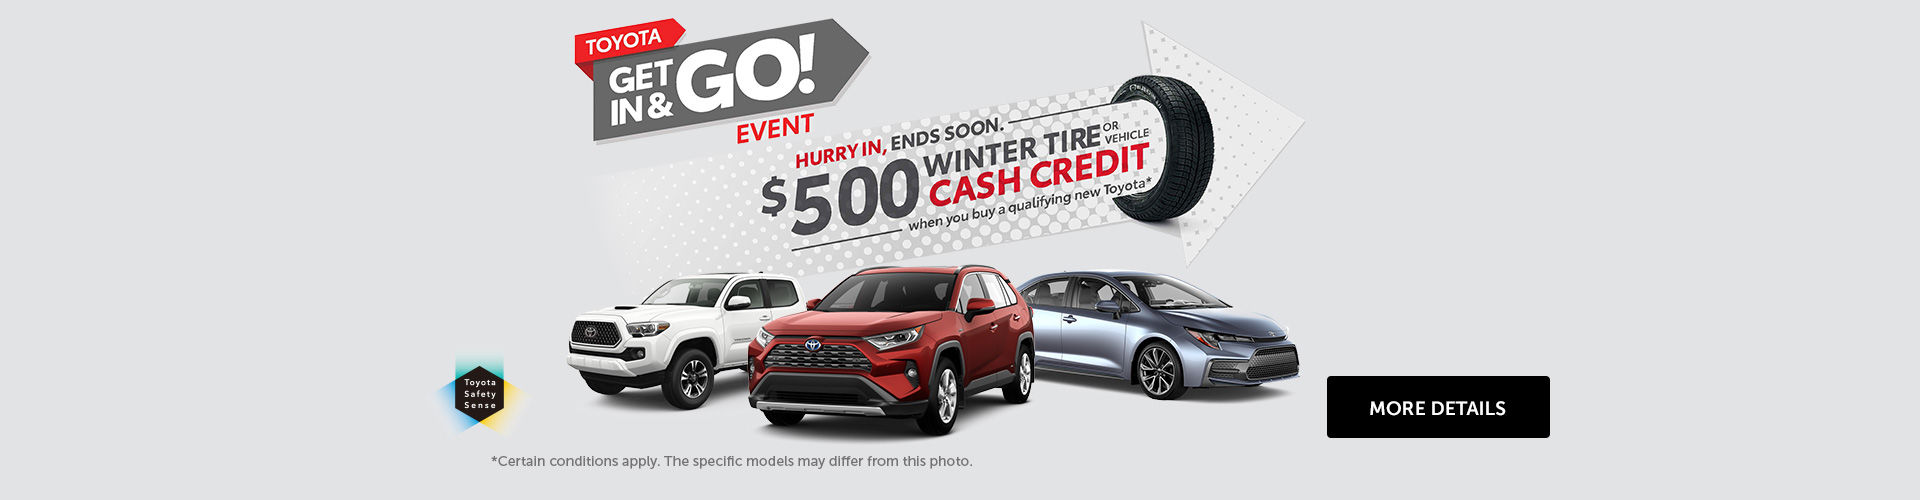 Toyota Event!